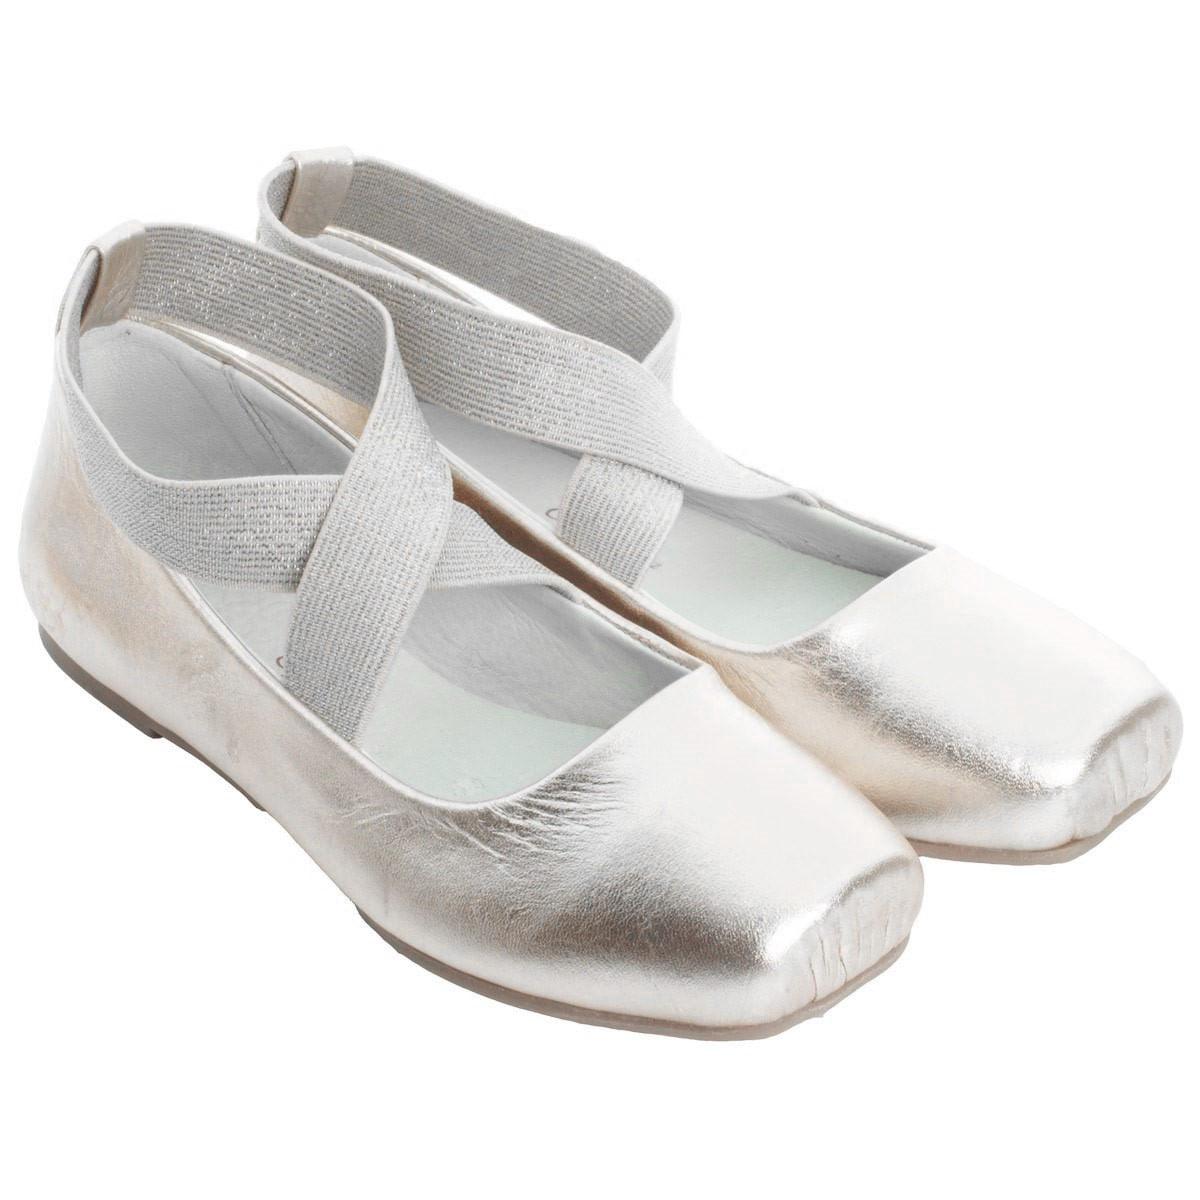 Sapatilha-Infantil-Ballet-L-B-Ludique-et-Badin--22-ao-36-